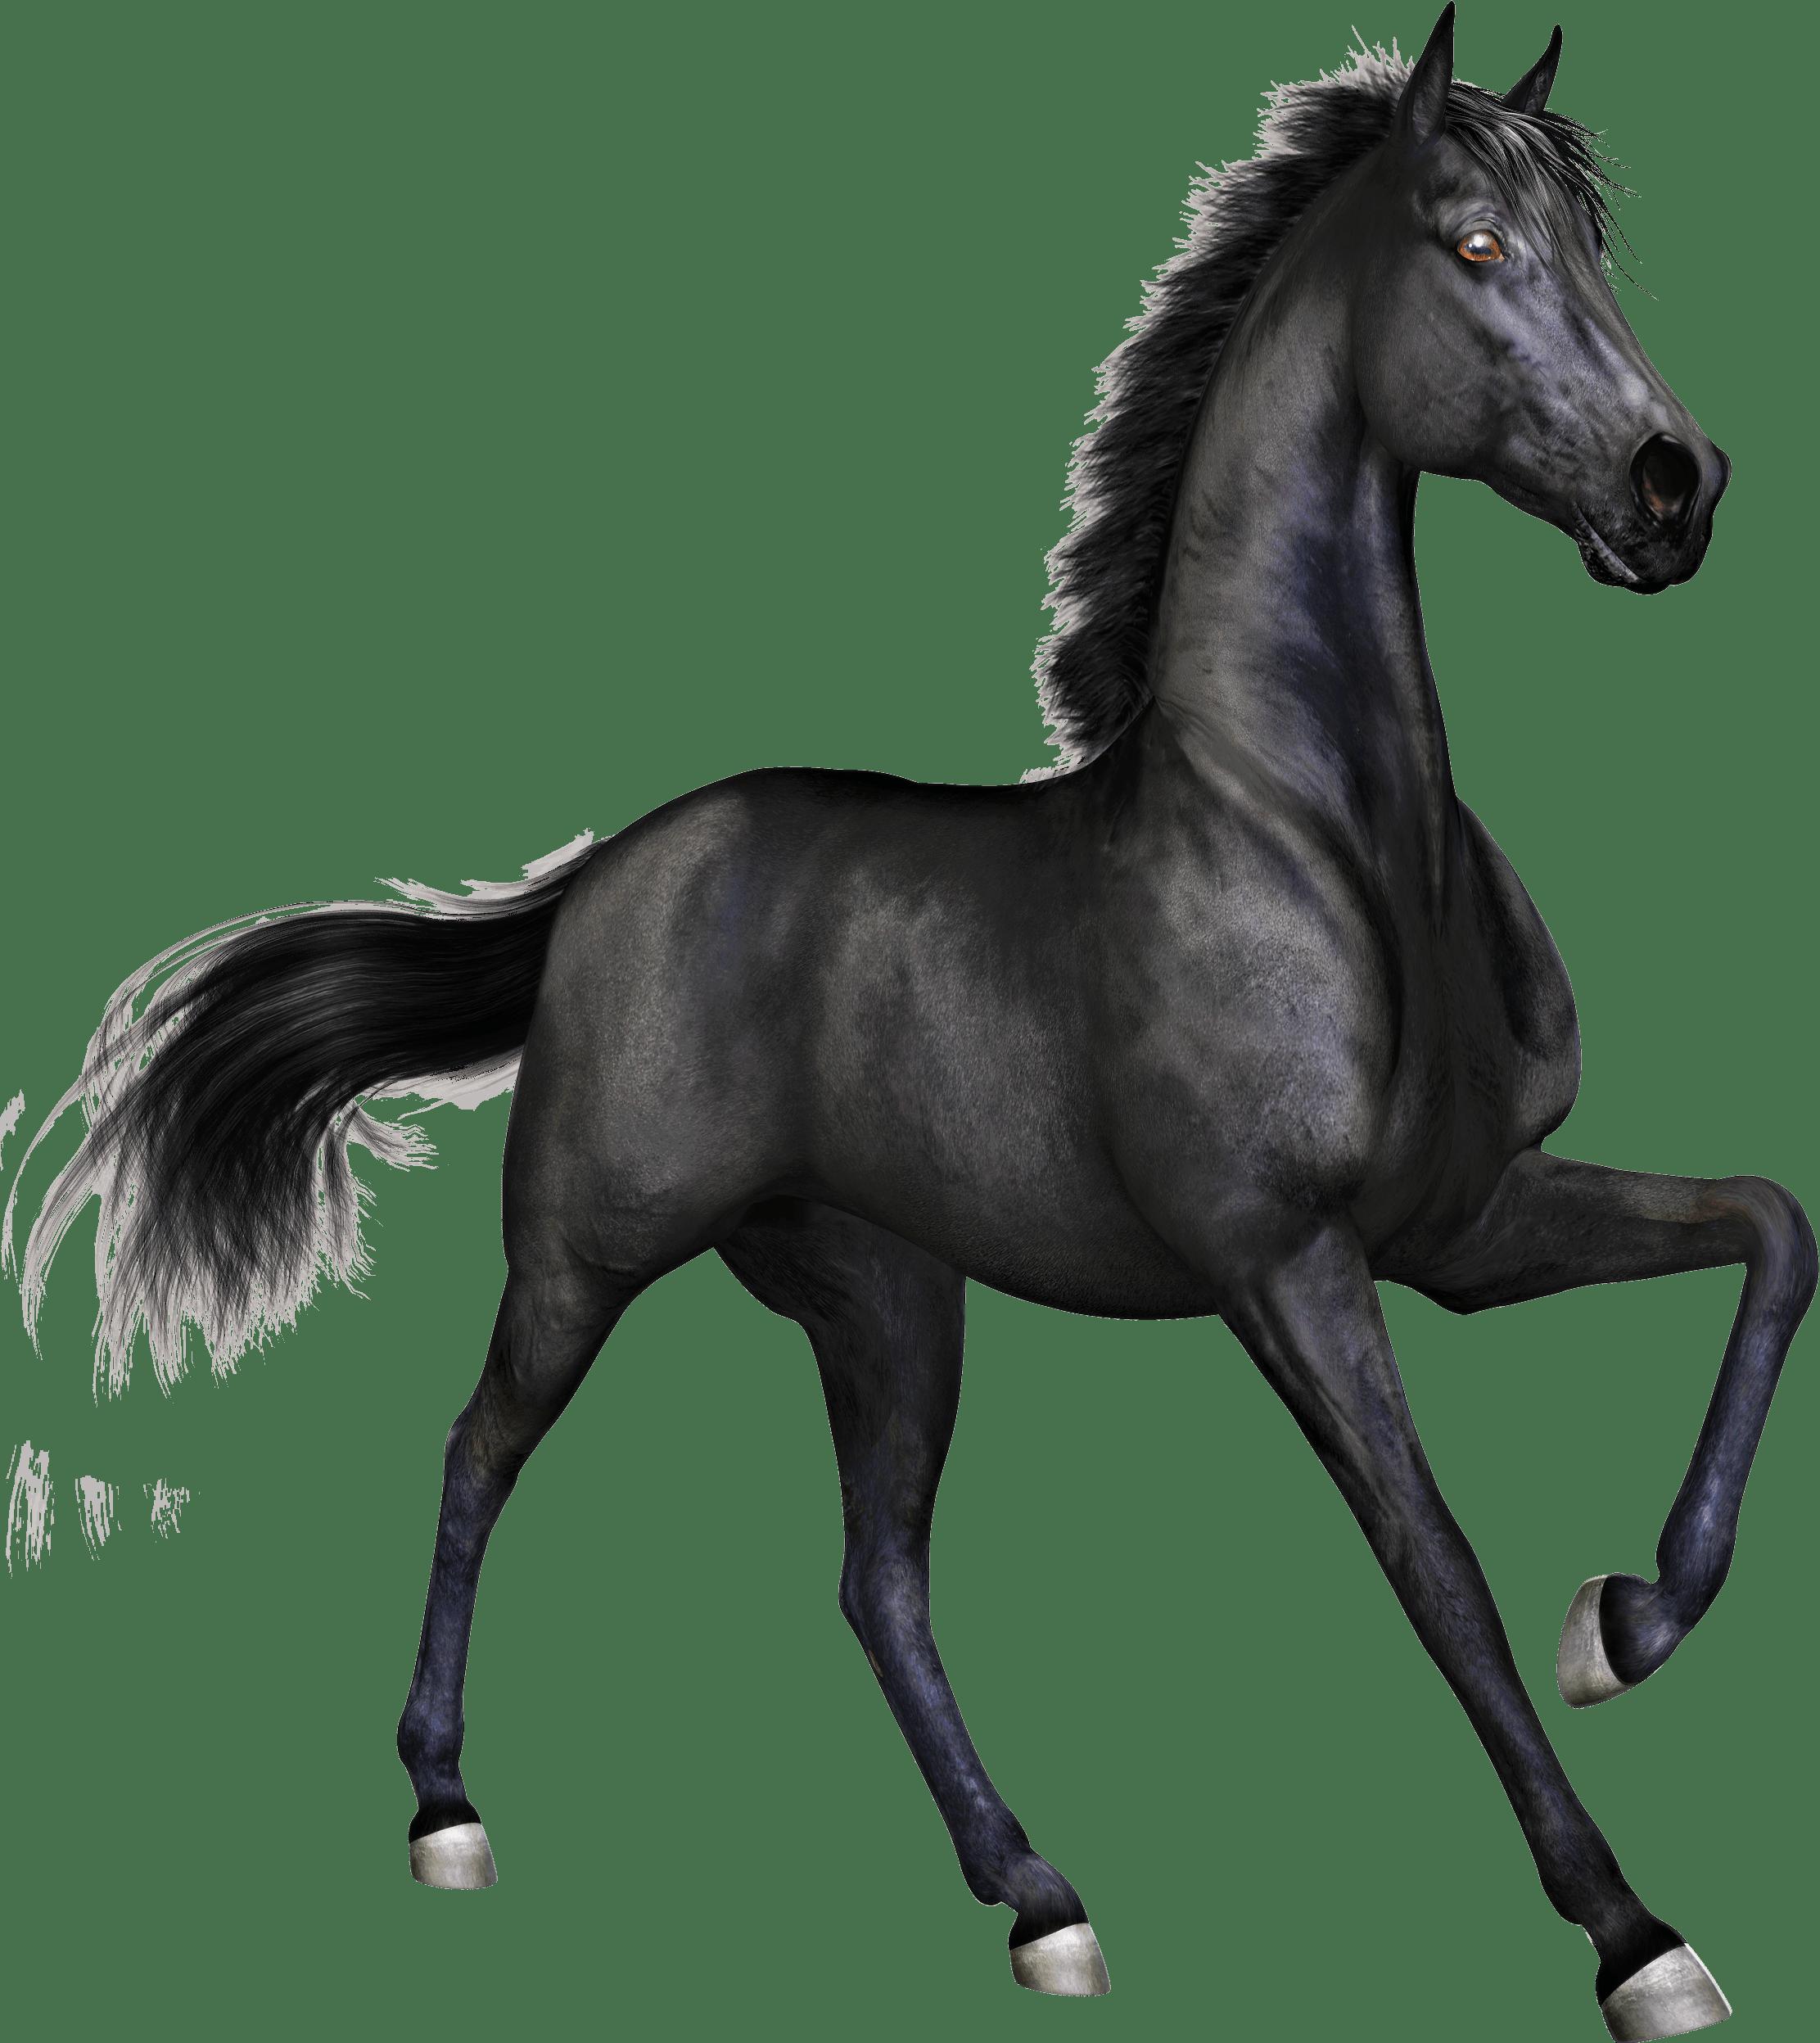 Horses transparent png images. Race clipart animal race